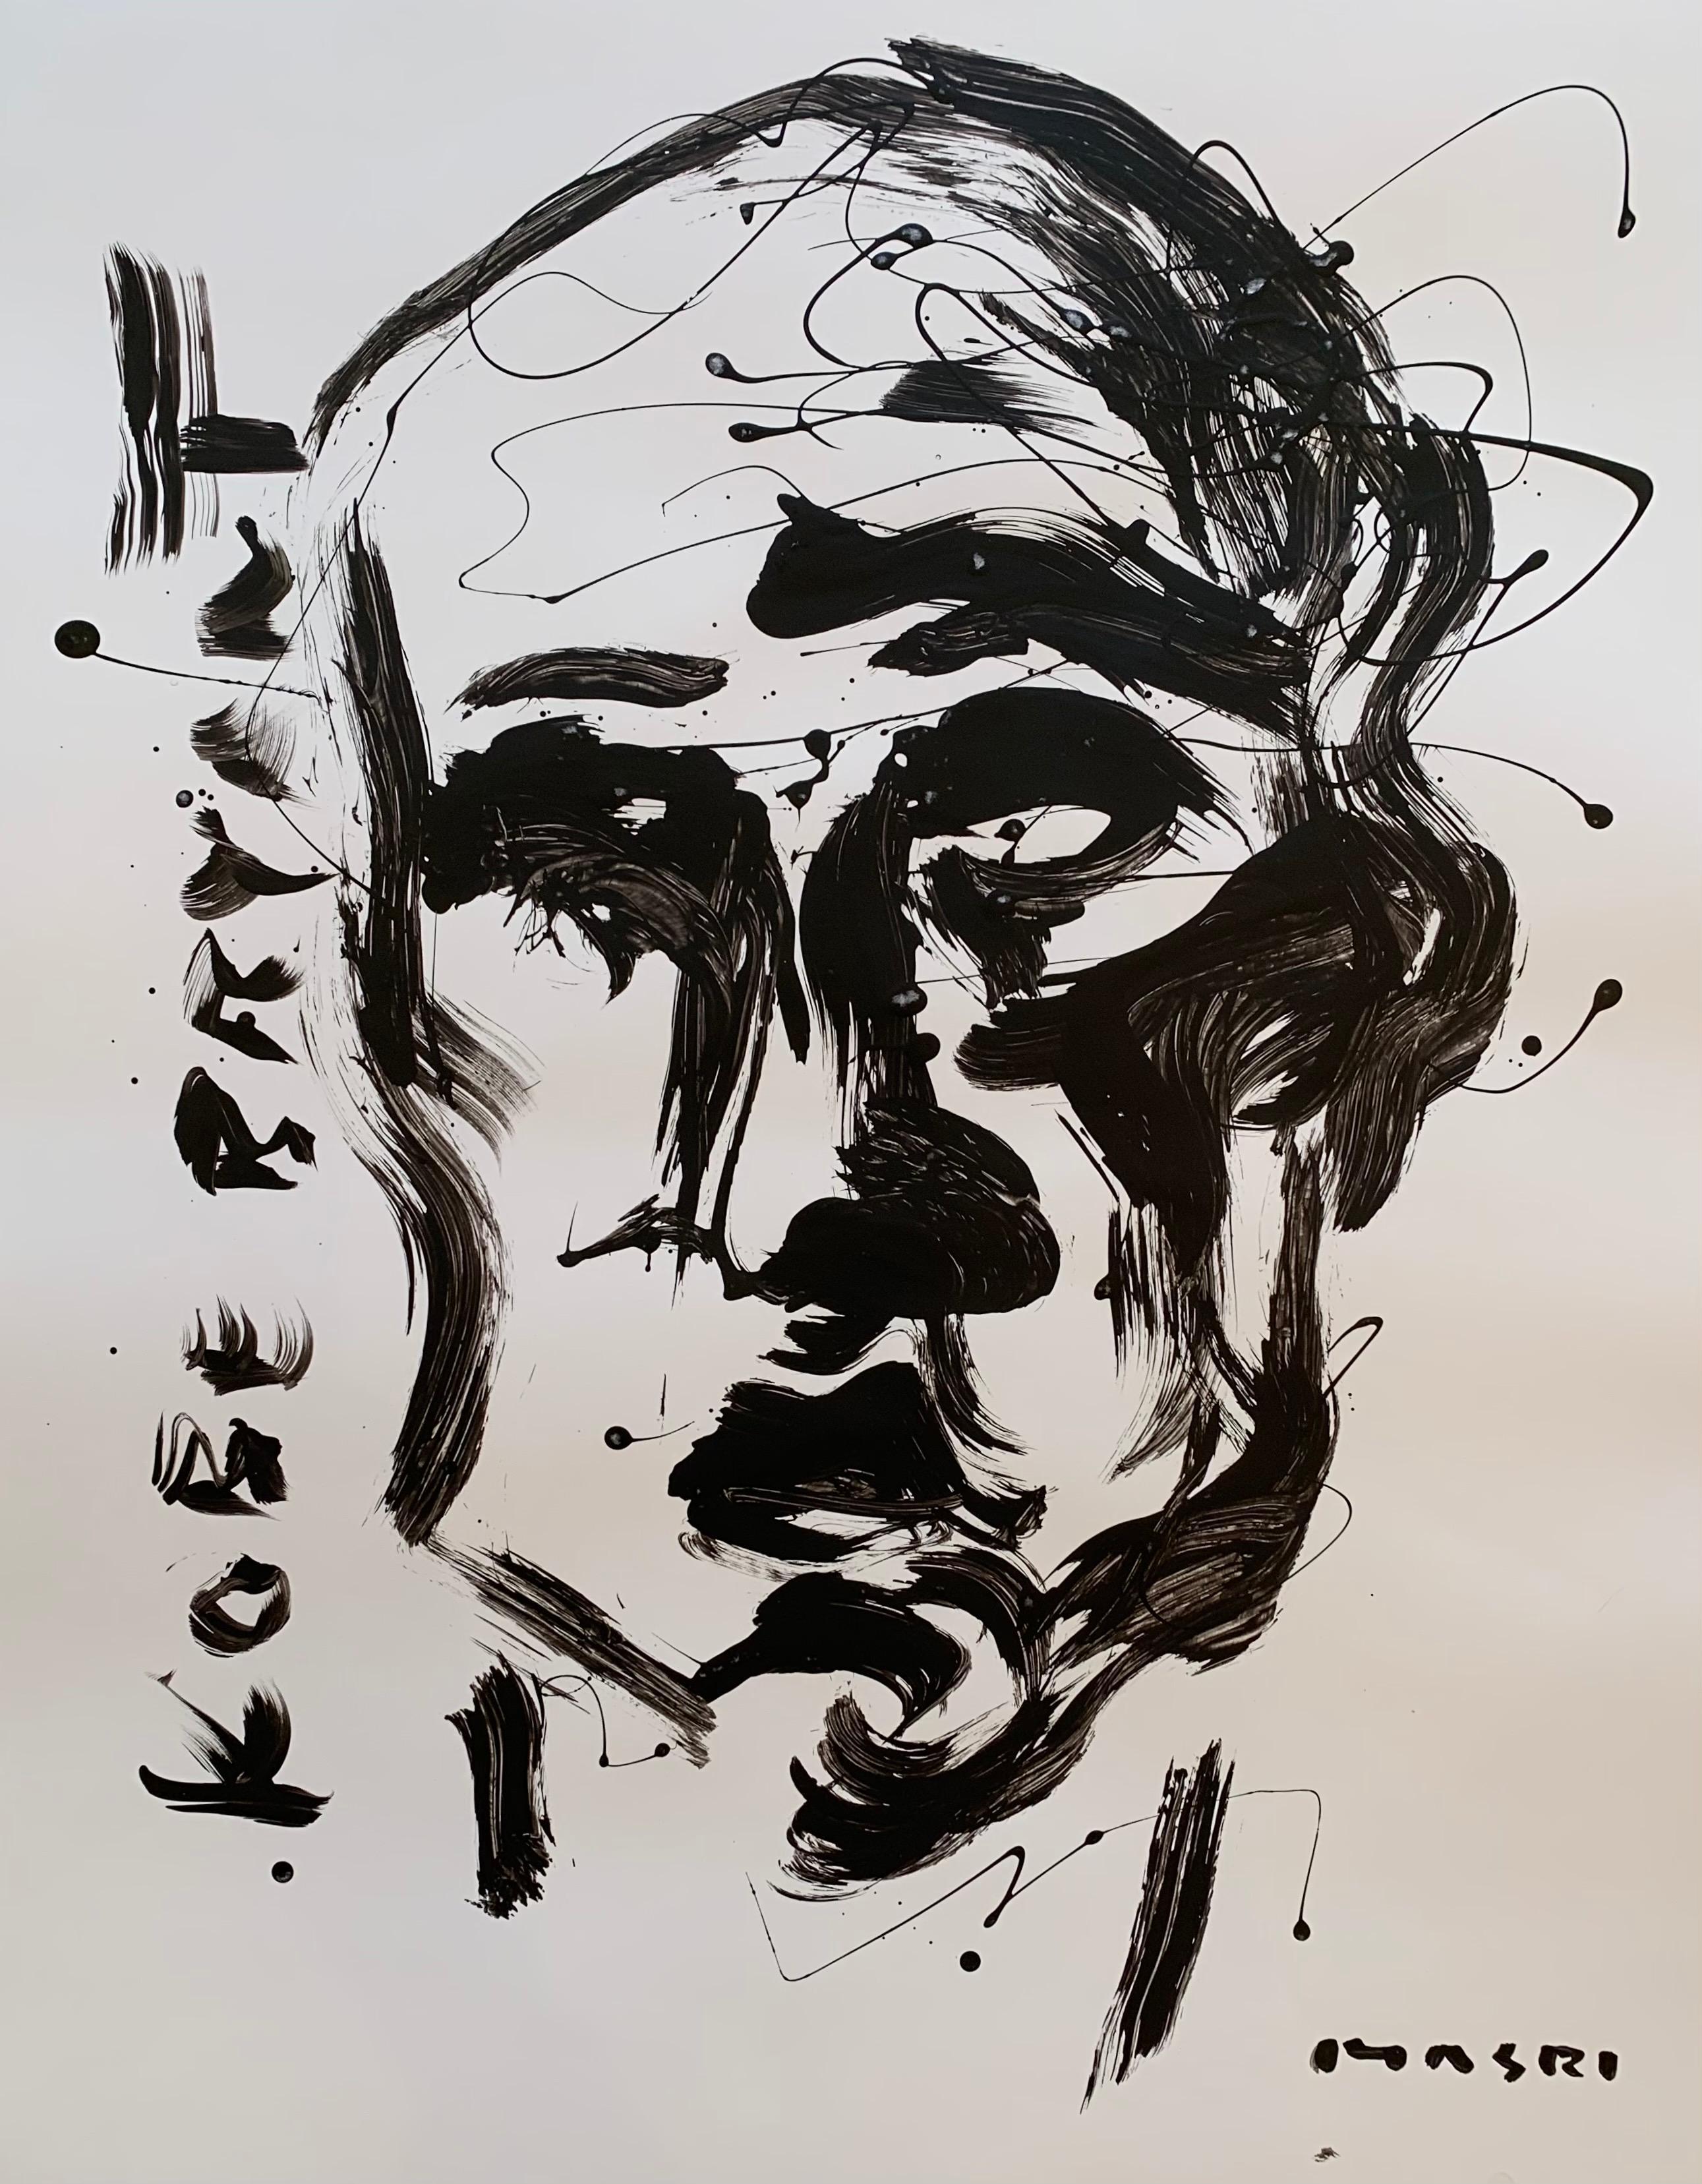 """Kobe Bryant"" Oil on paper Original piece by Masri"